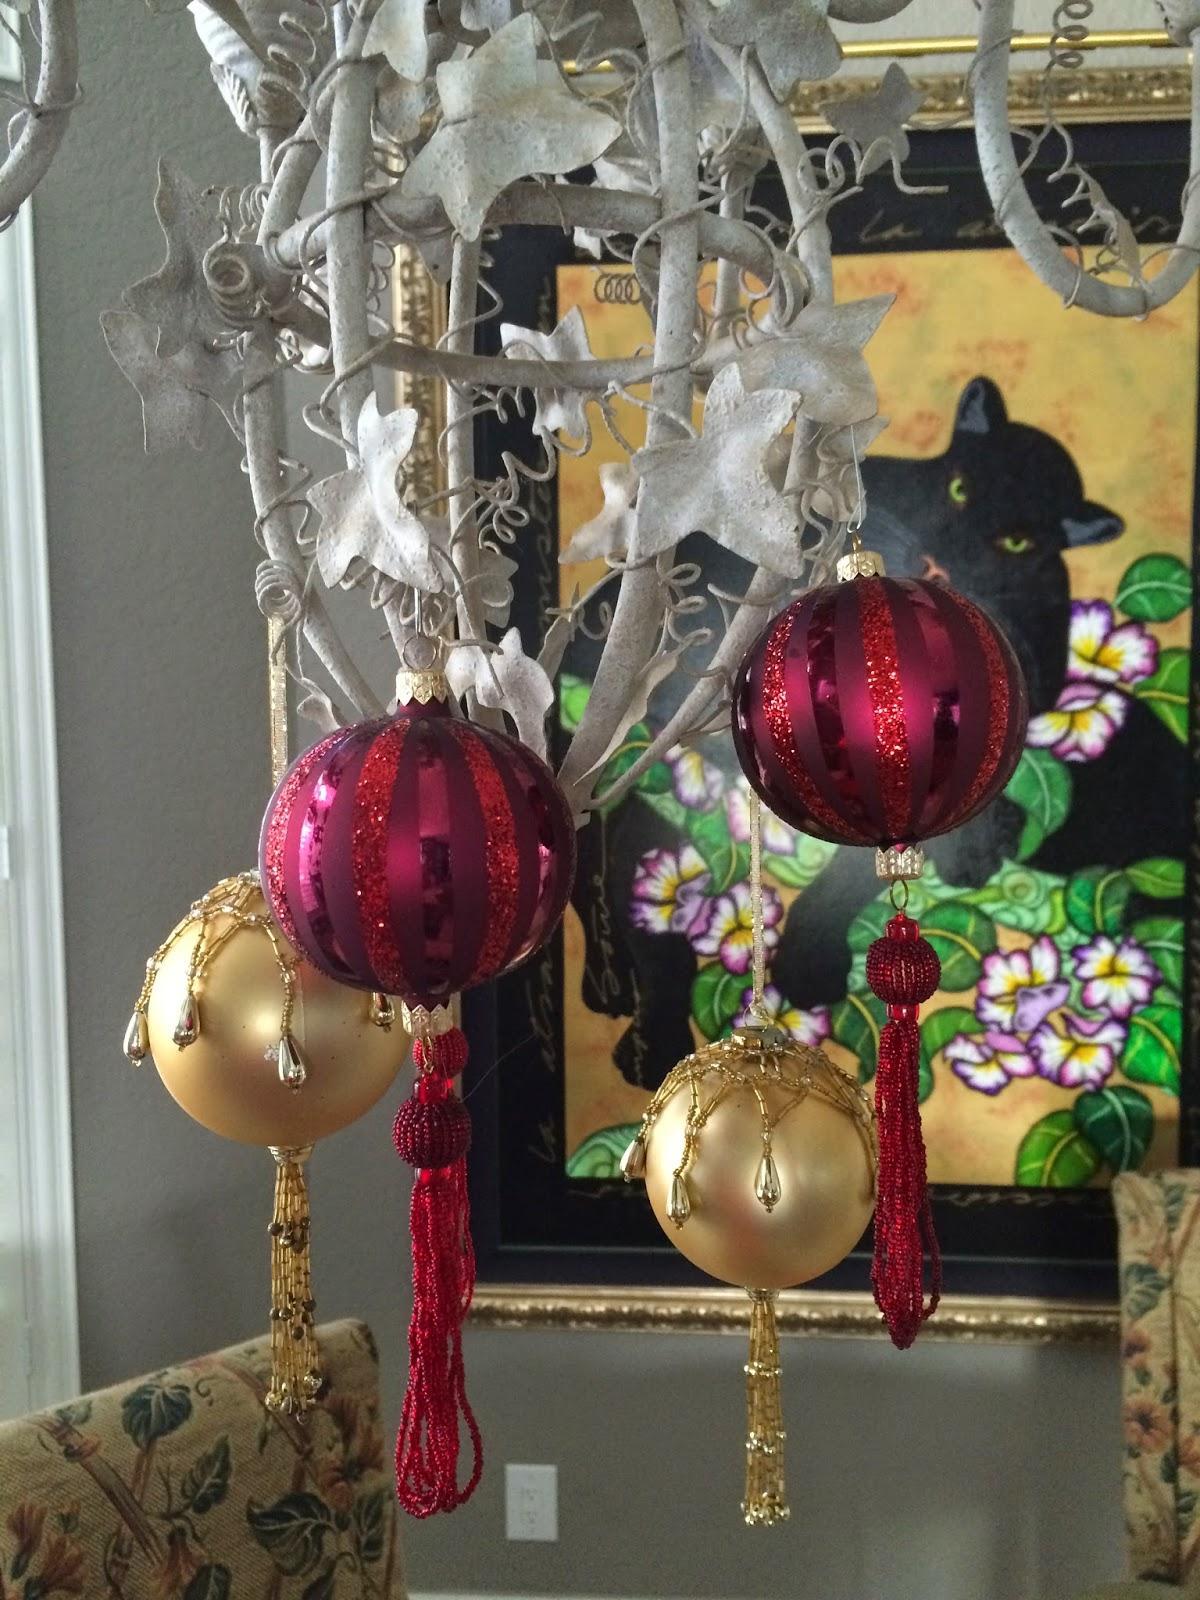 Christmas Desire and Spirit